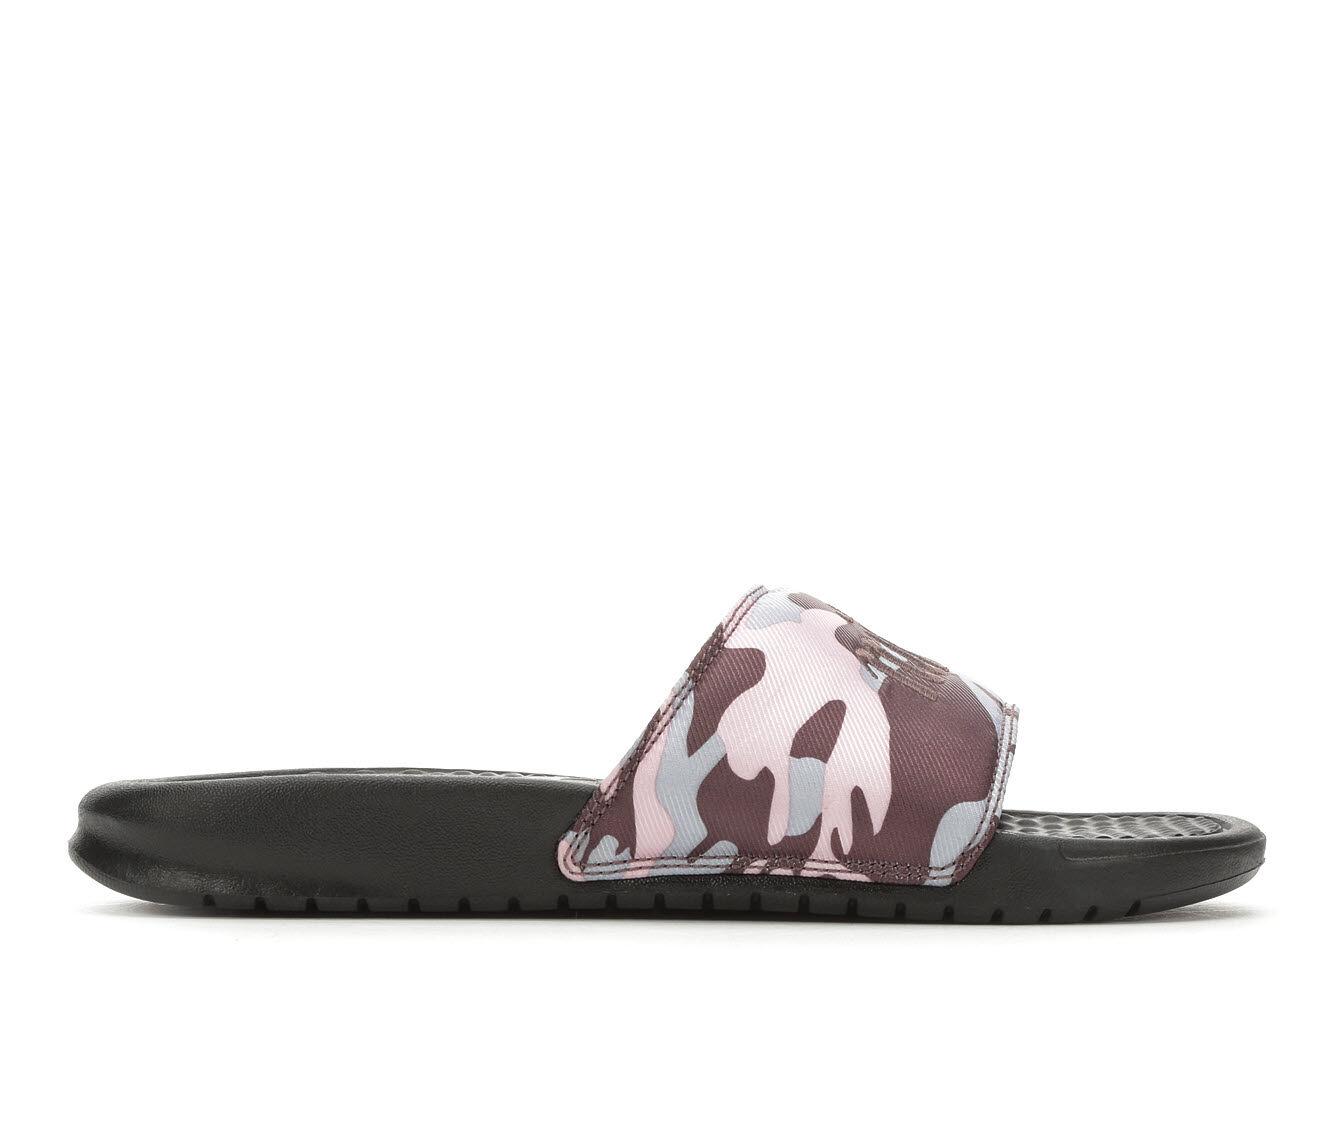 Women's Nike Benassi JDI Camo Sport Sandals Plum/Obsidian